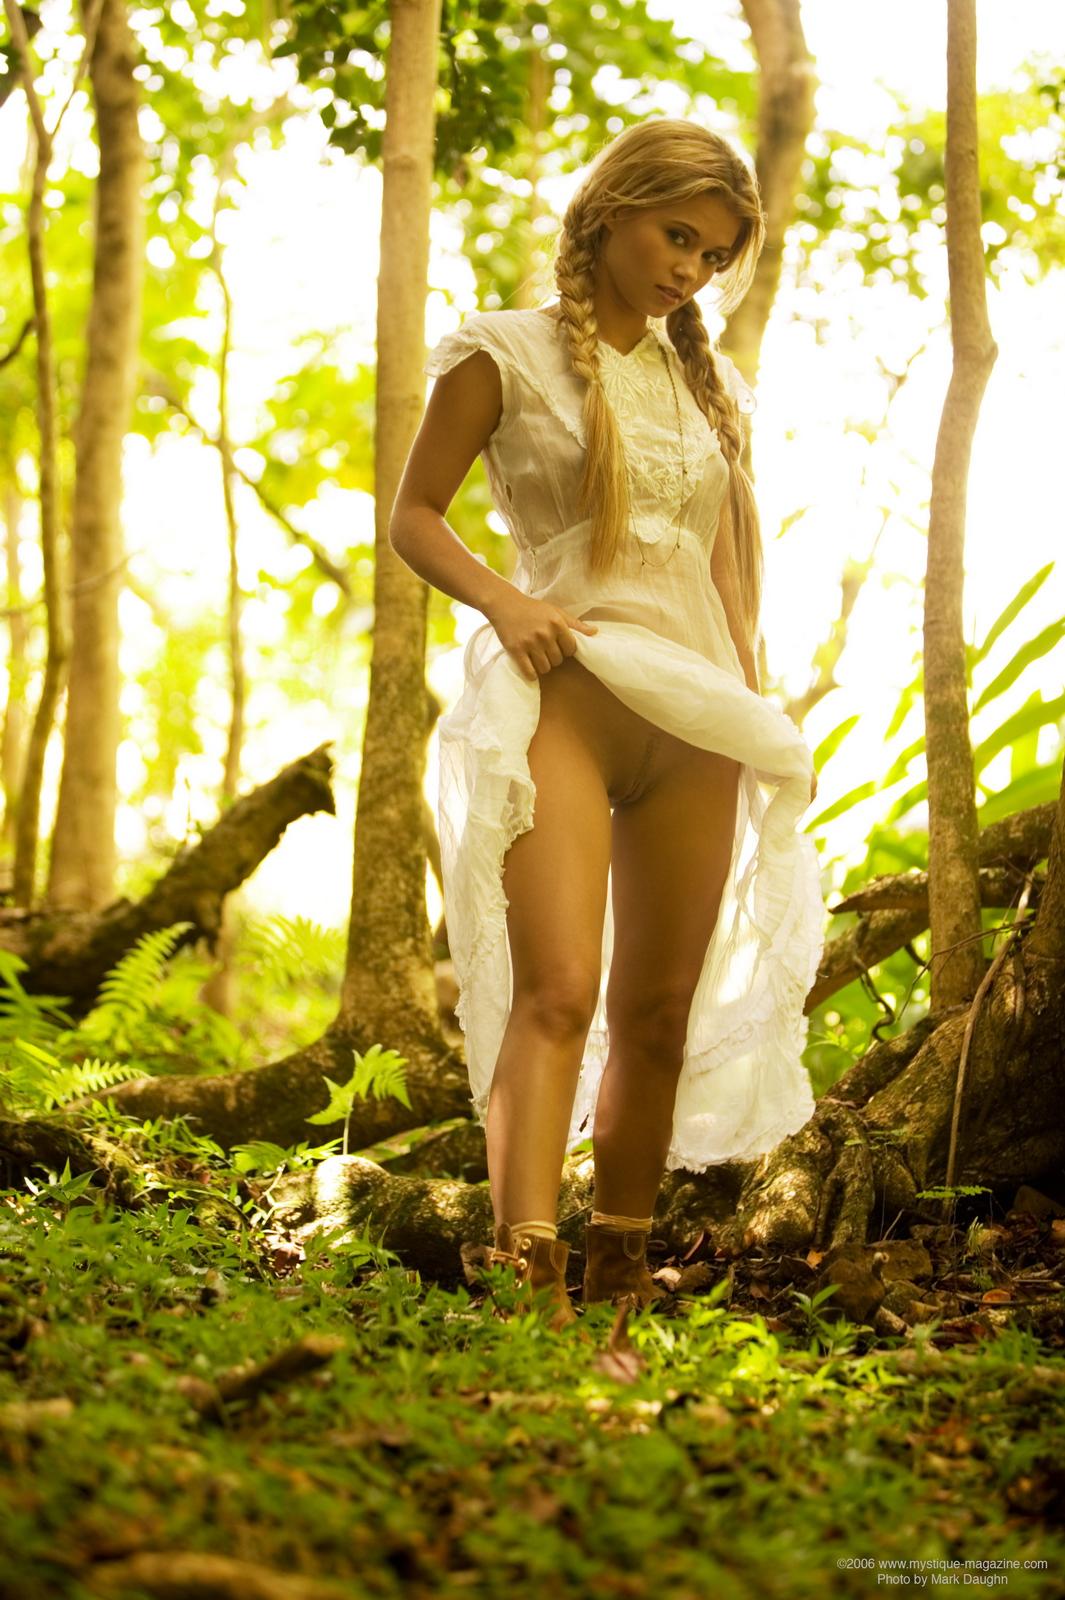 jannah-burnham-woods-blonde-pigtails-naked-mystique-magazine-07